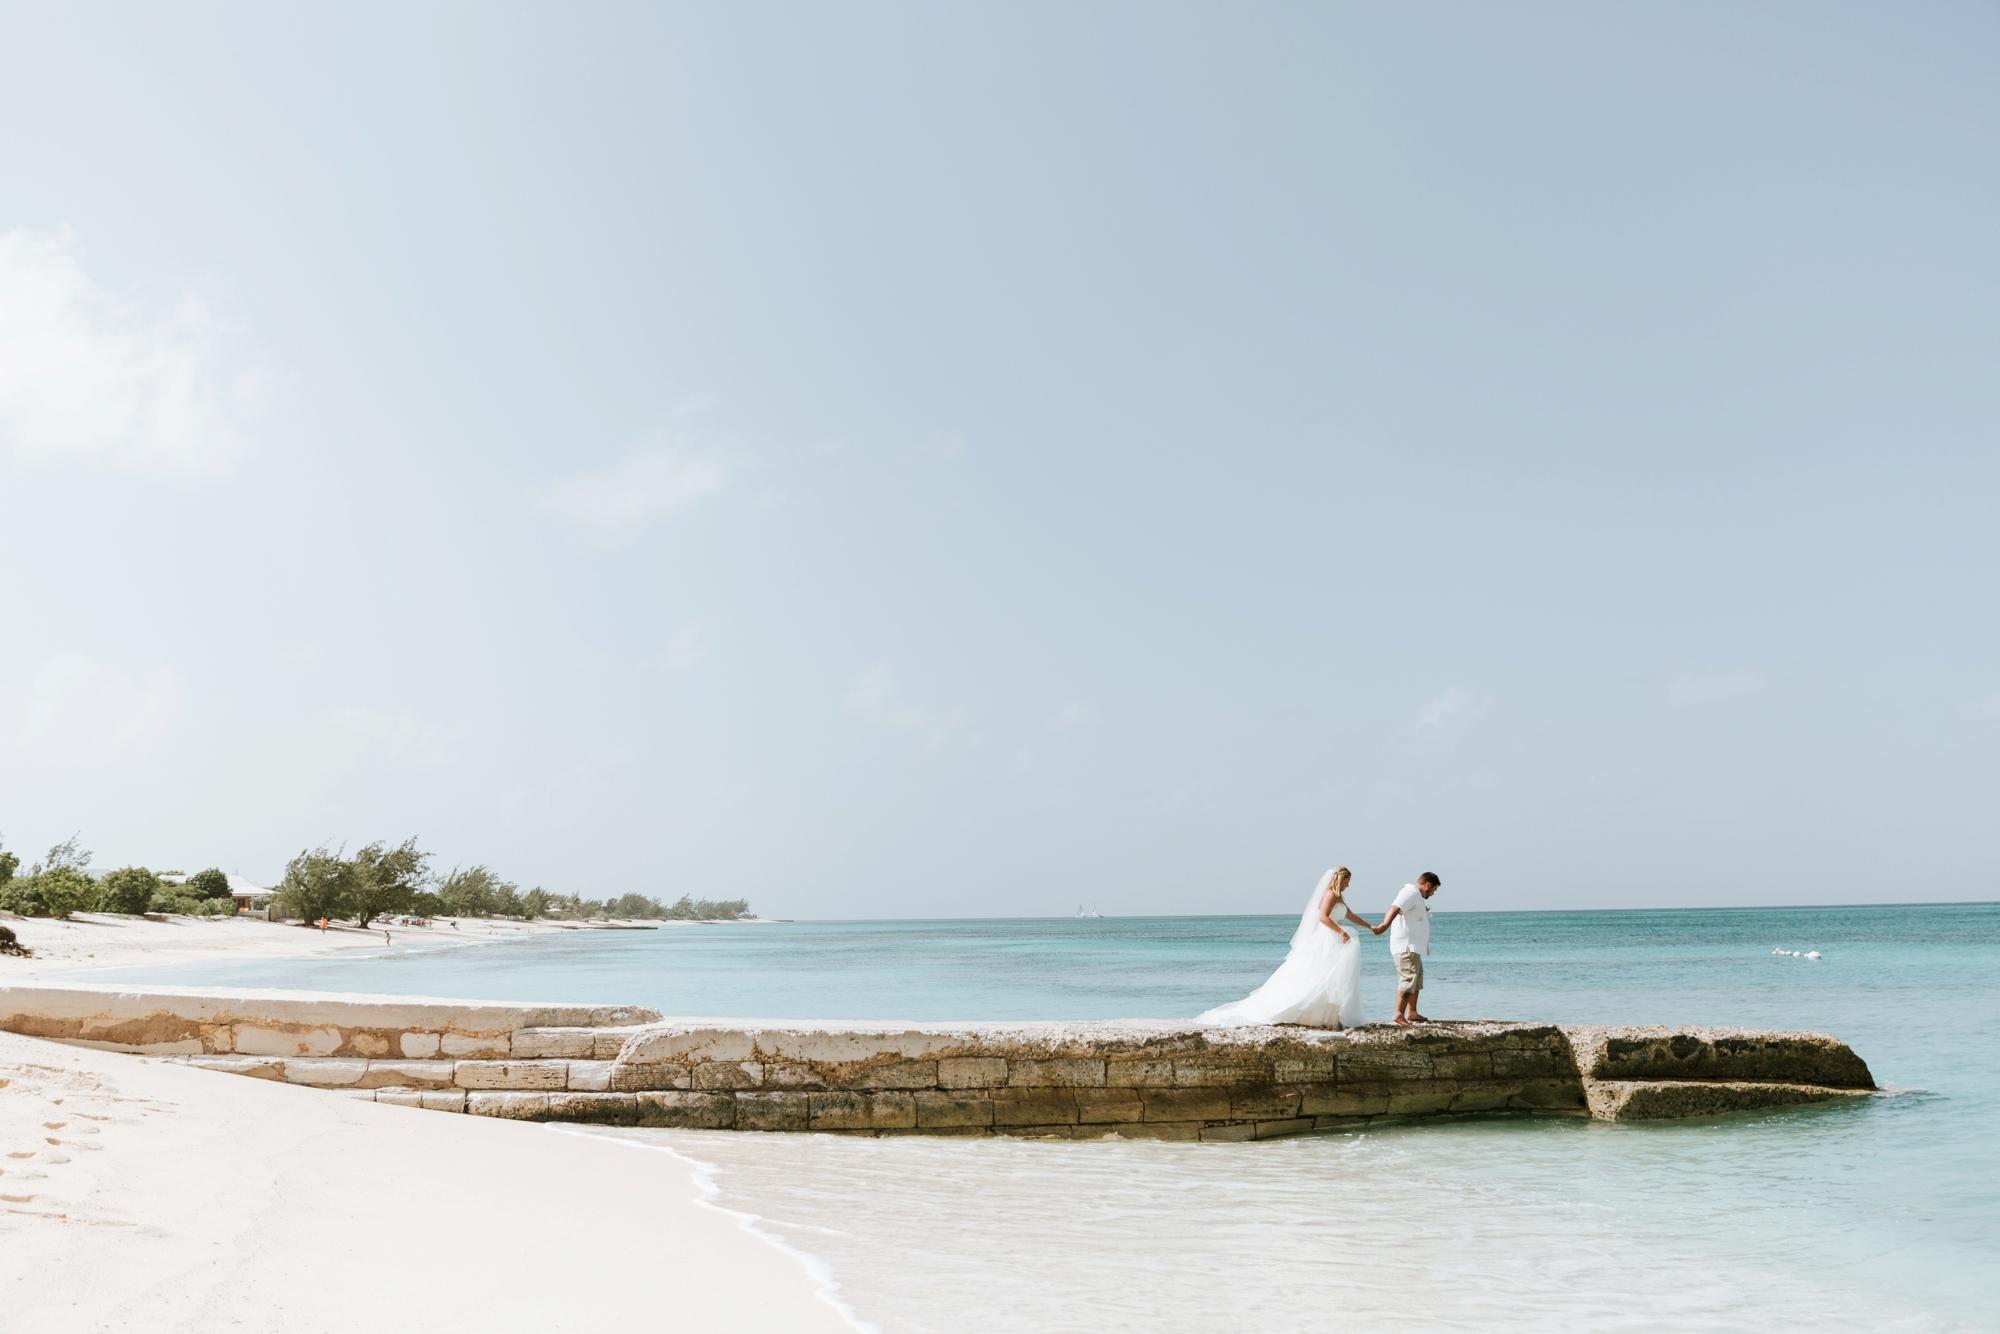 Caribbean weddings grand turk - Grand Turk Destination Wedding _0028 Jpg